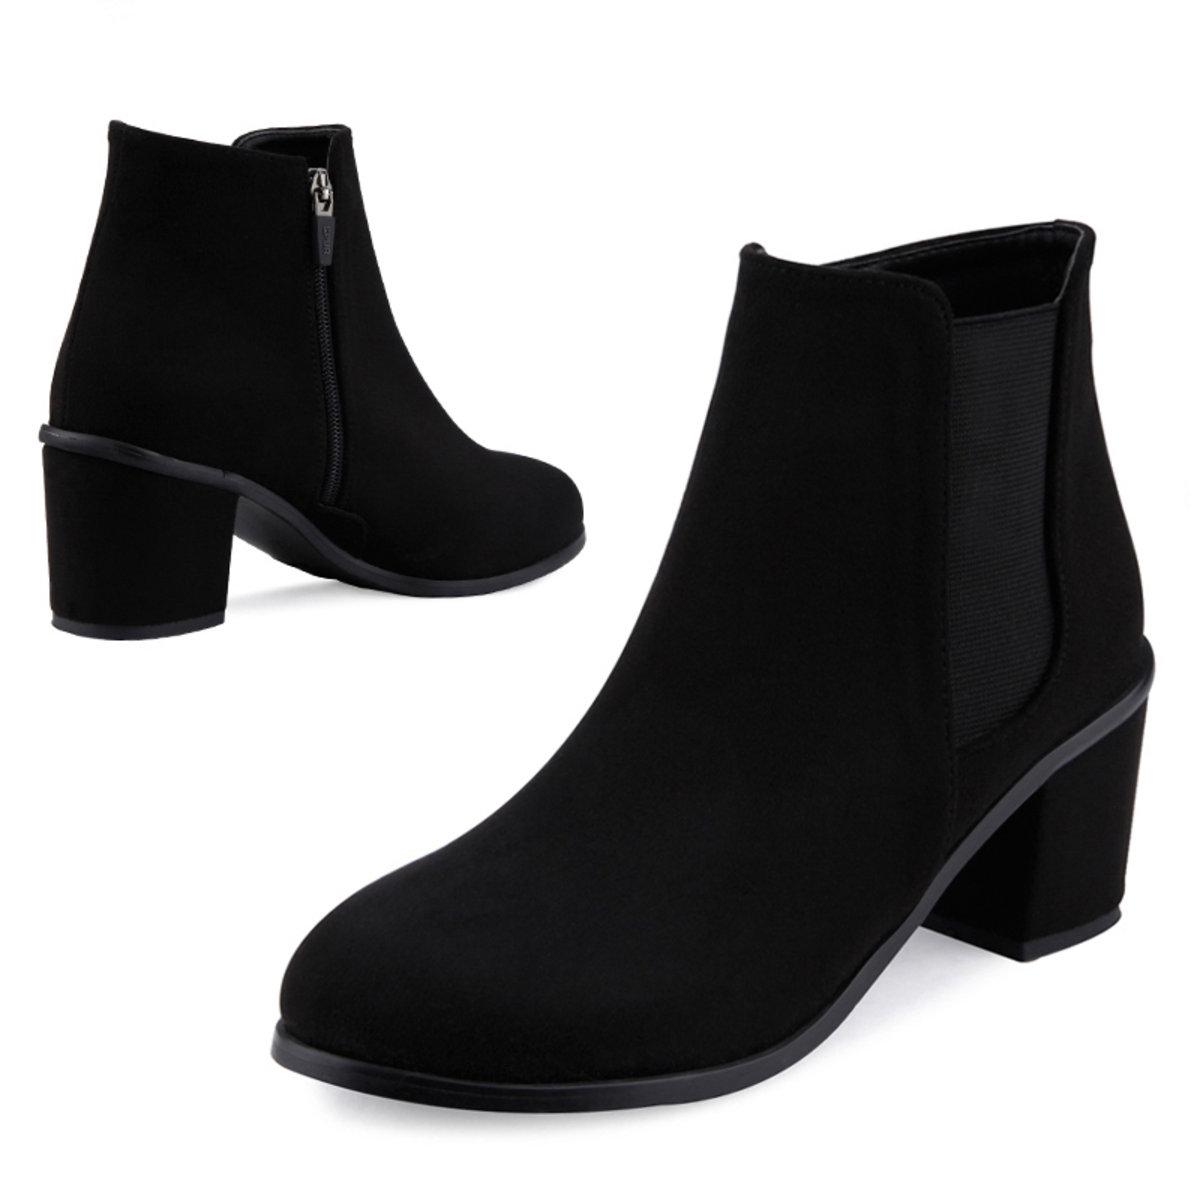 ec9316634 Soft essential chelsea boots